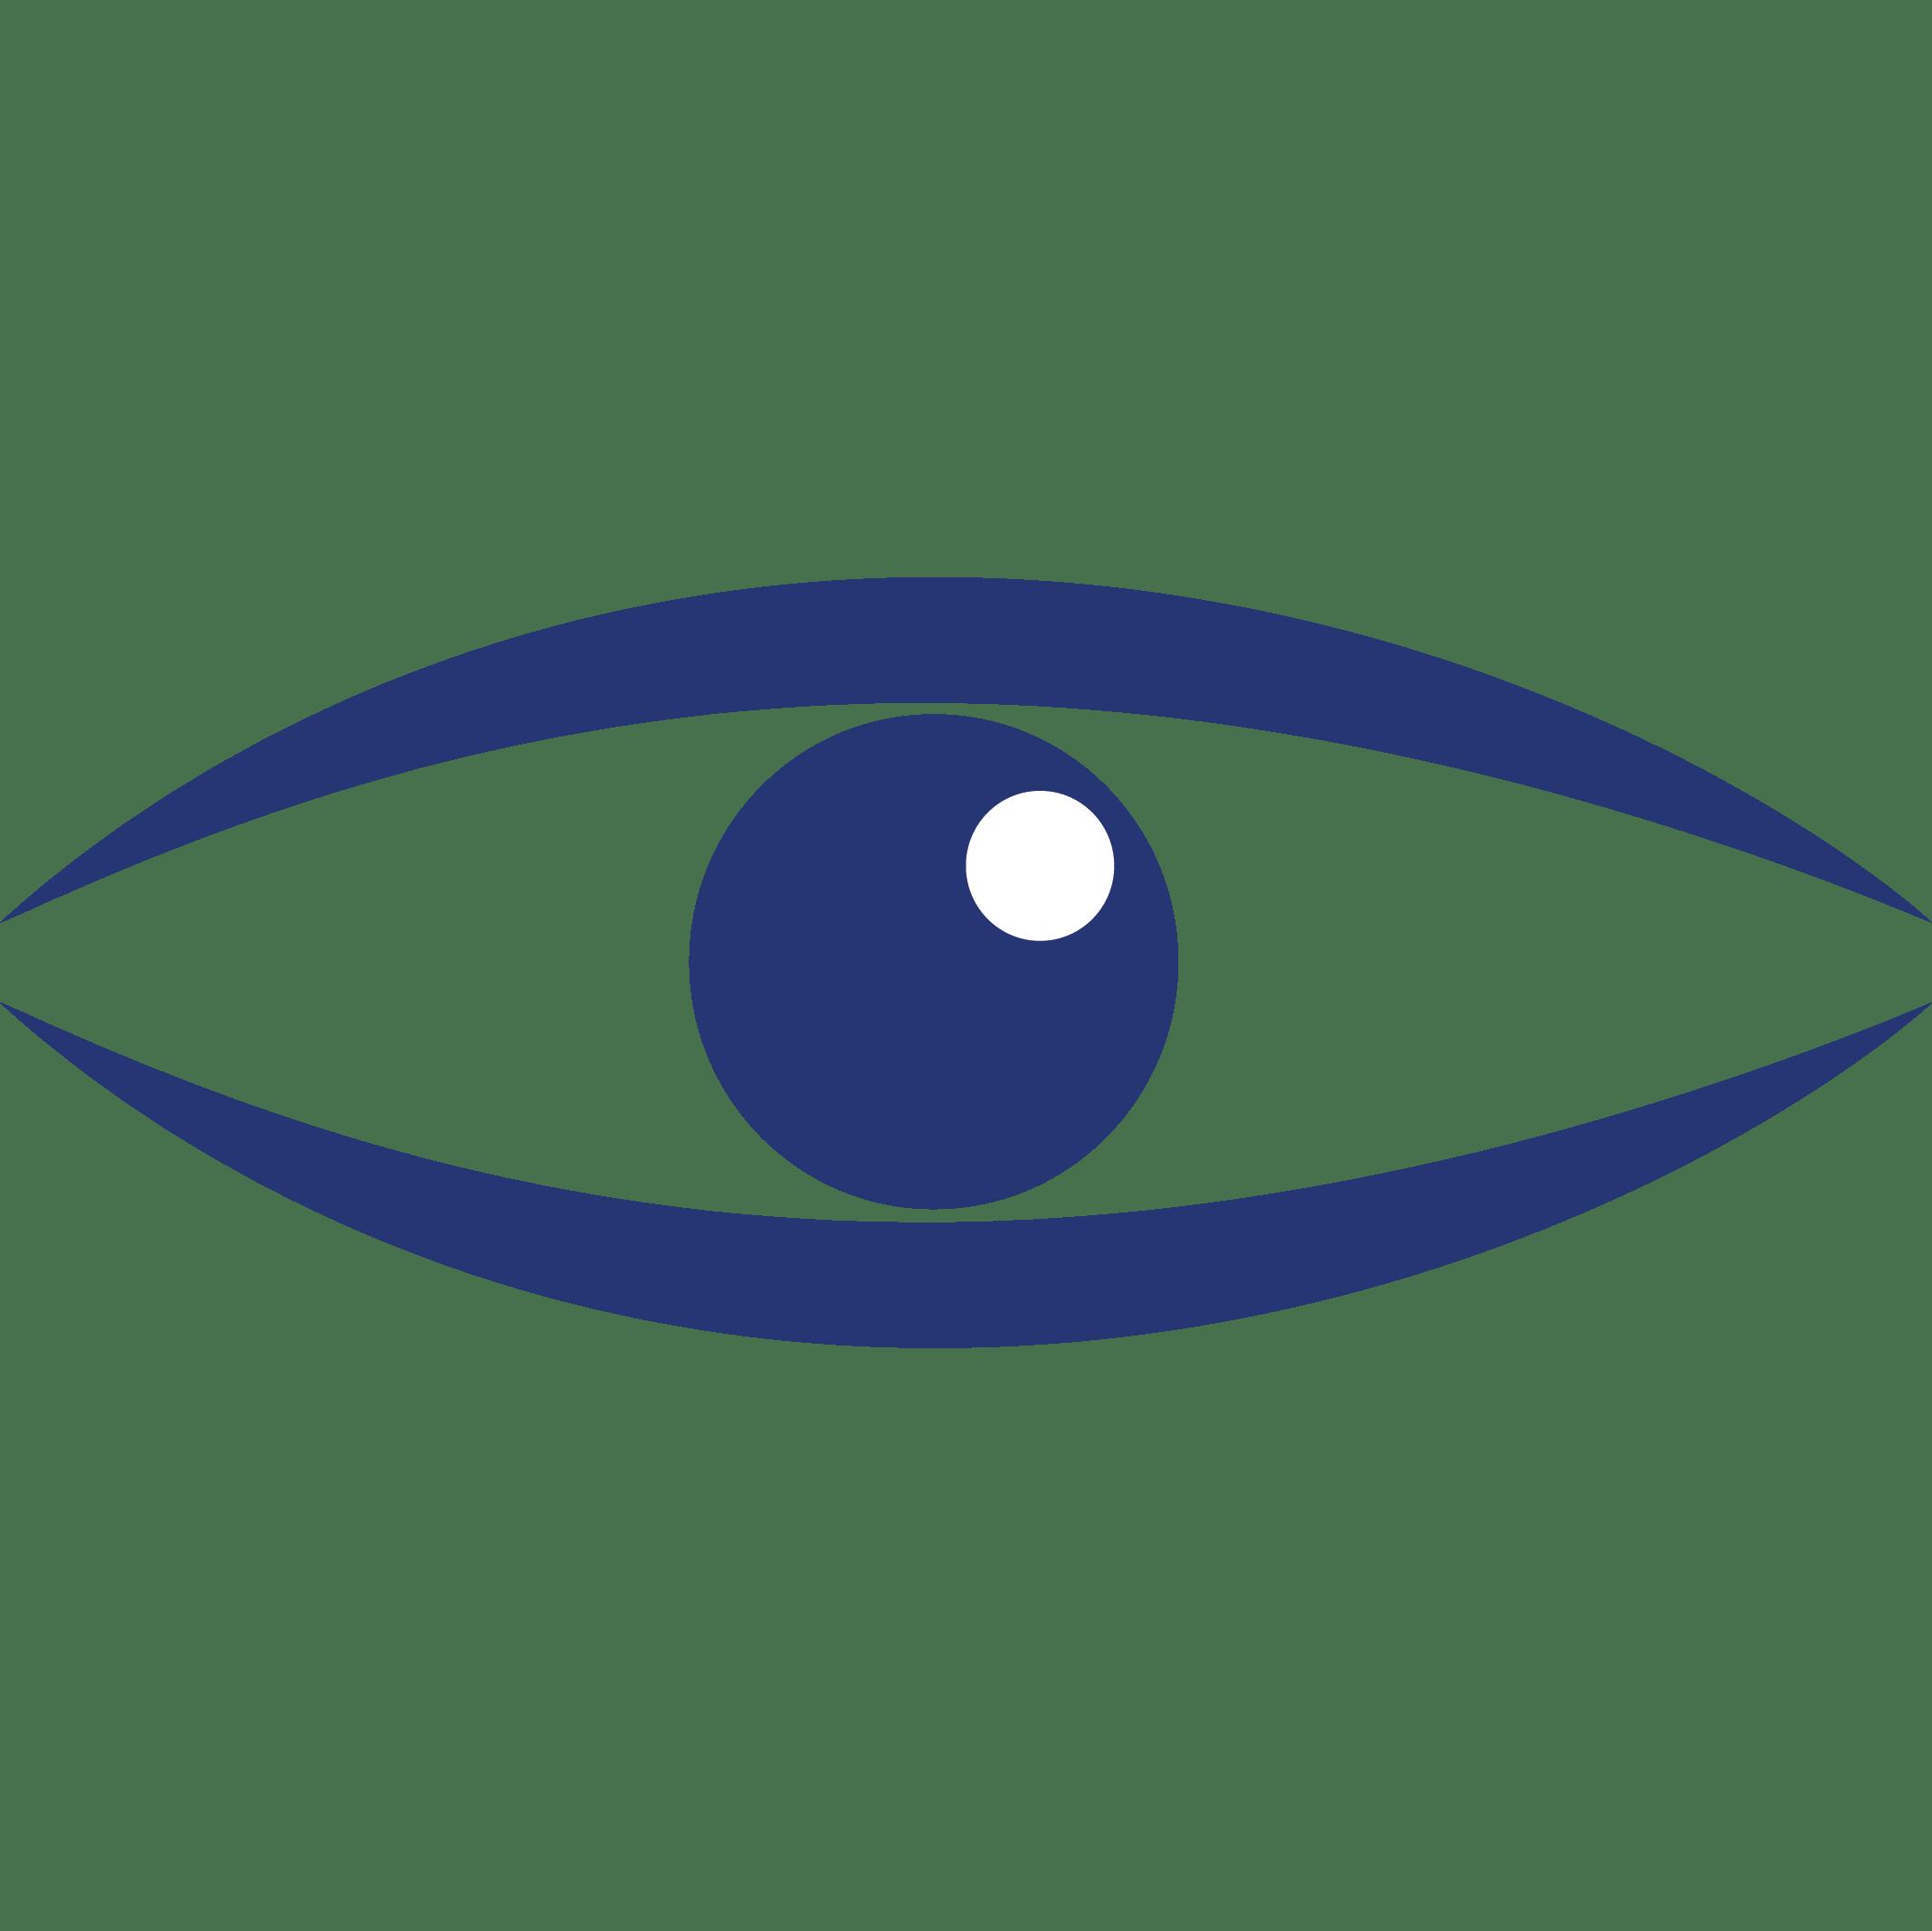 logo-dr-med.-markus-feichtinger-augenarzt-linz